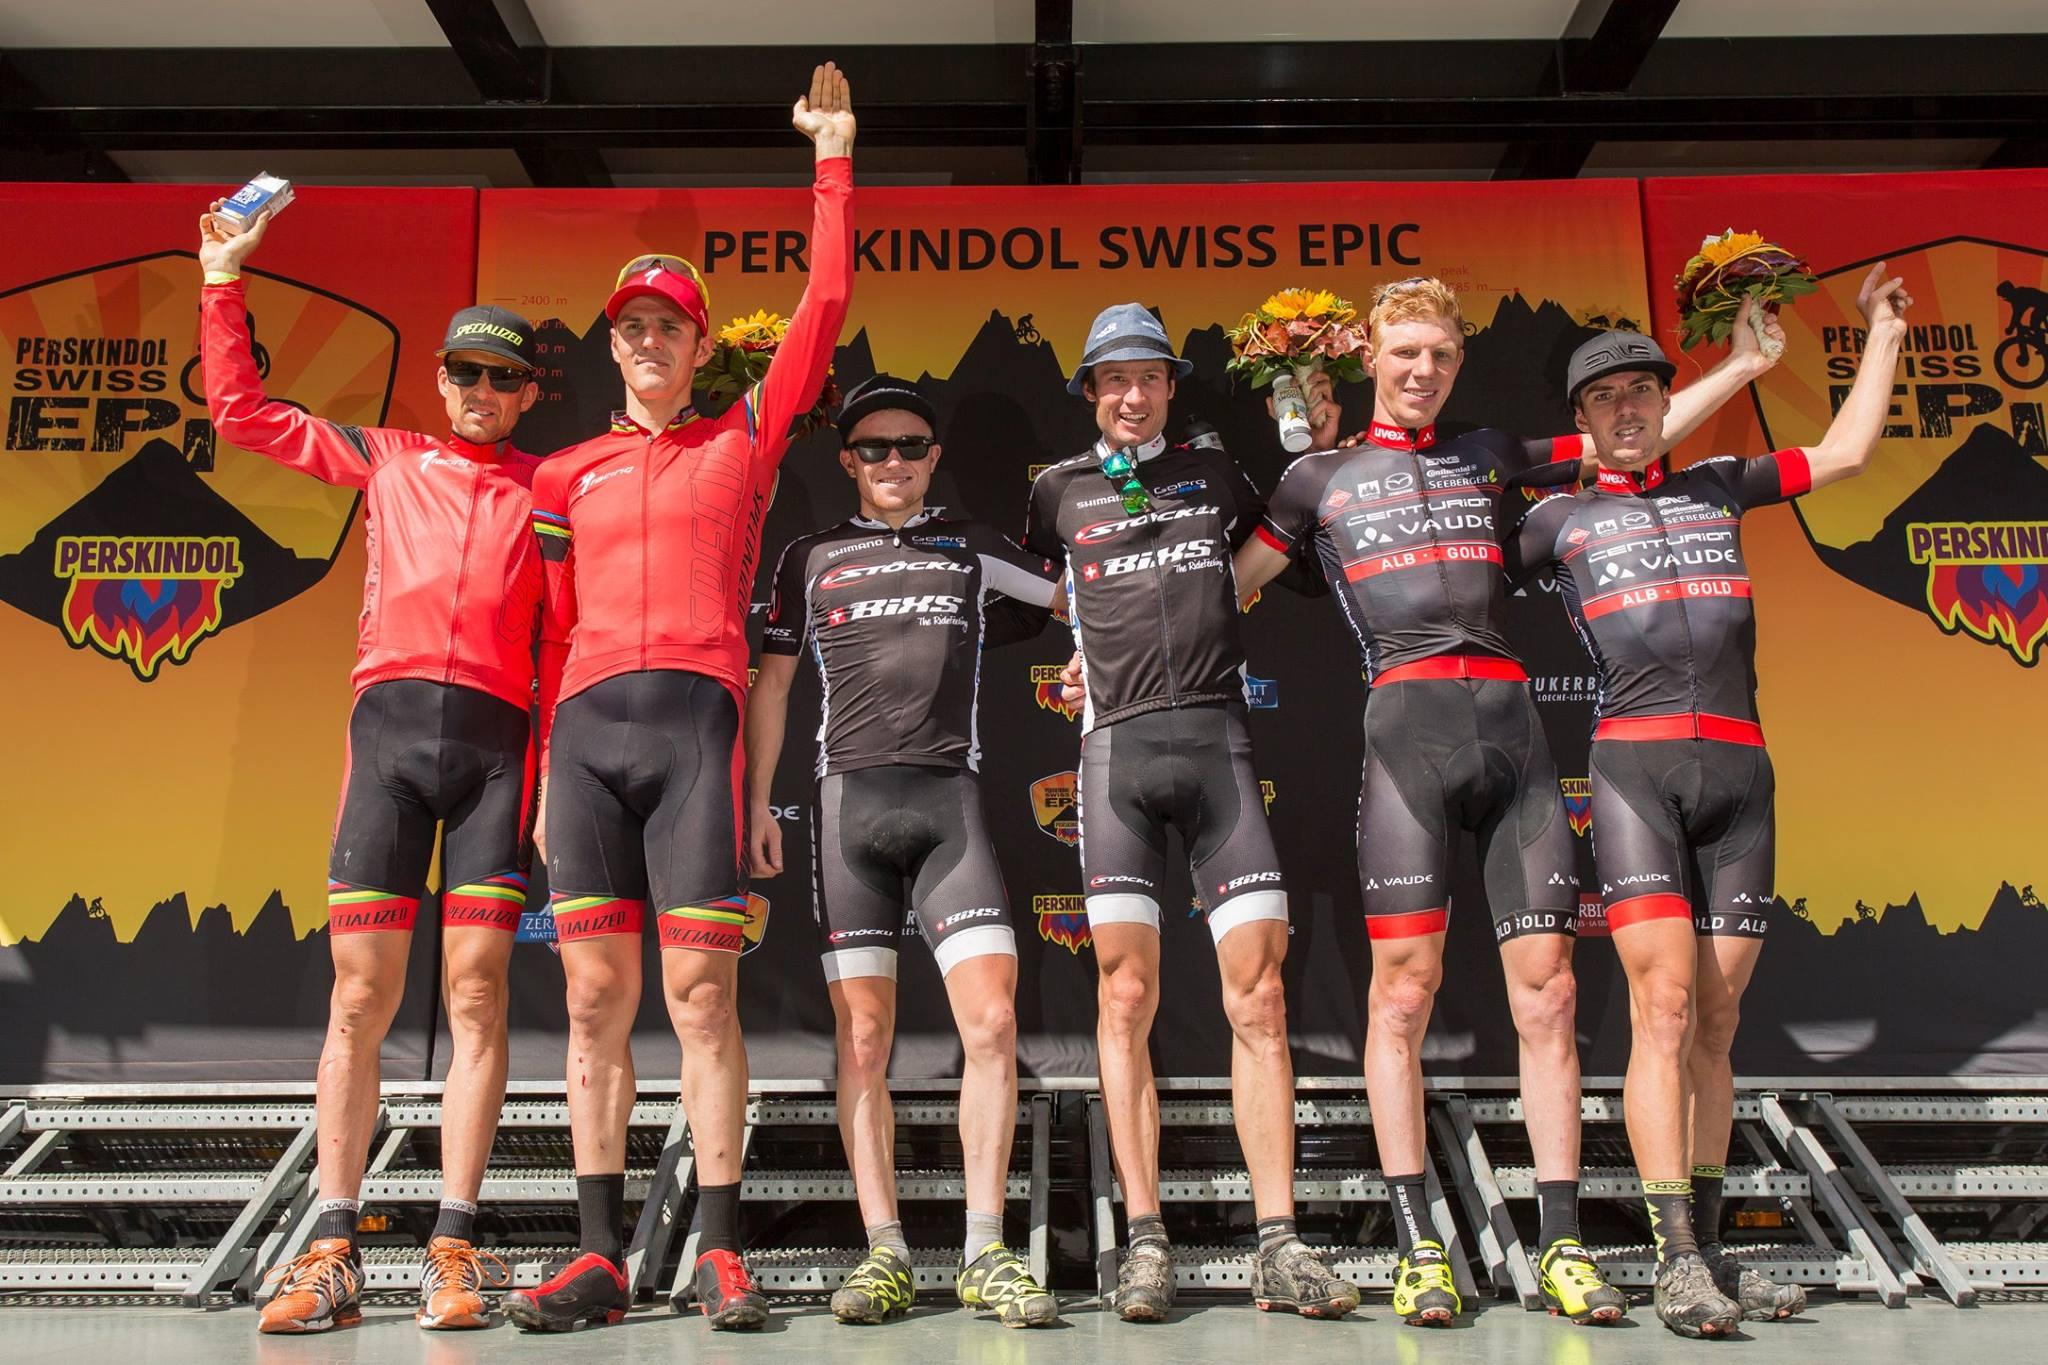 Perskindol Swiss Epic 2014 – ETAP 1